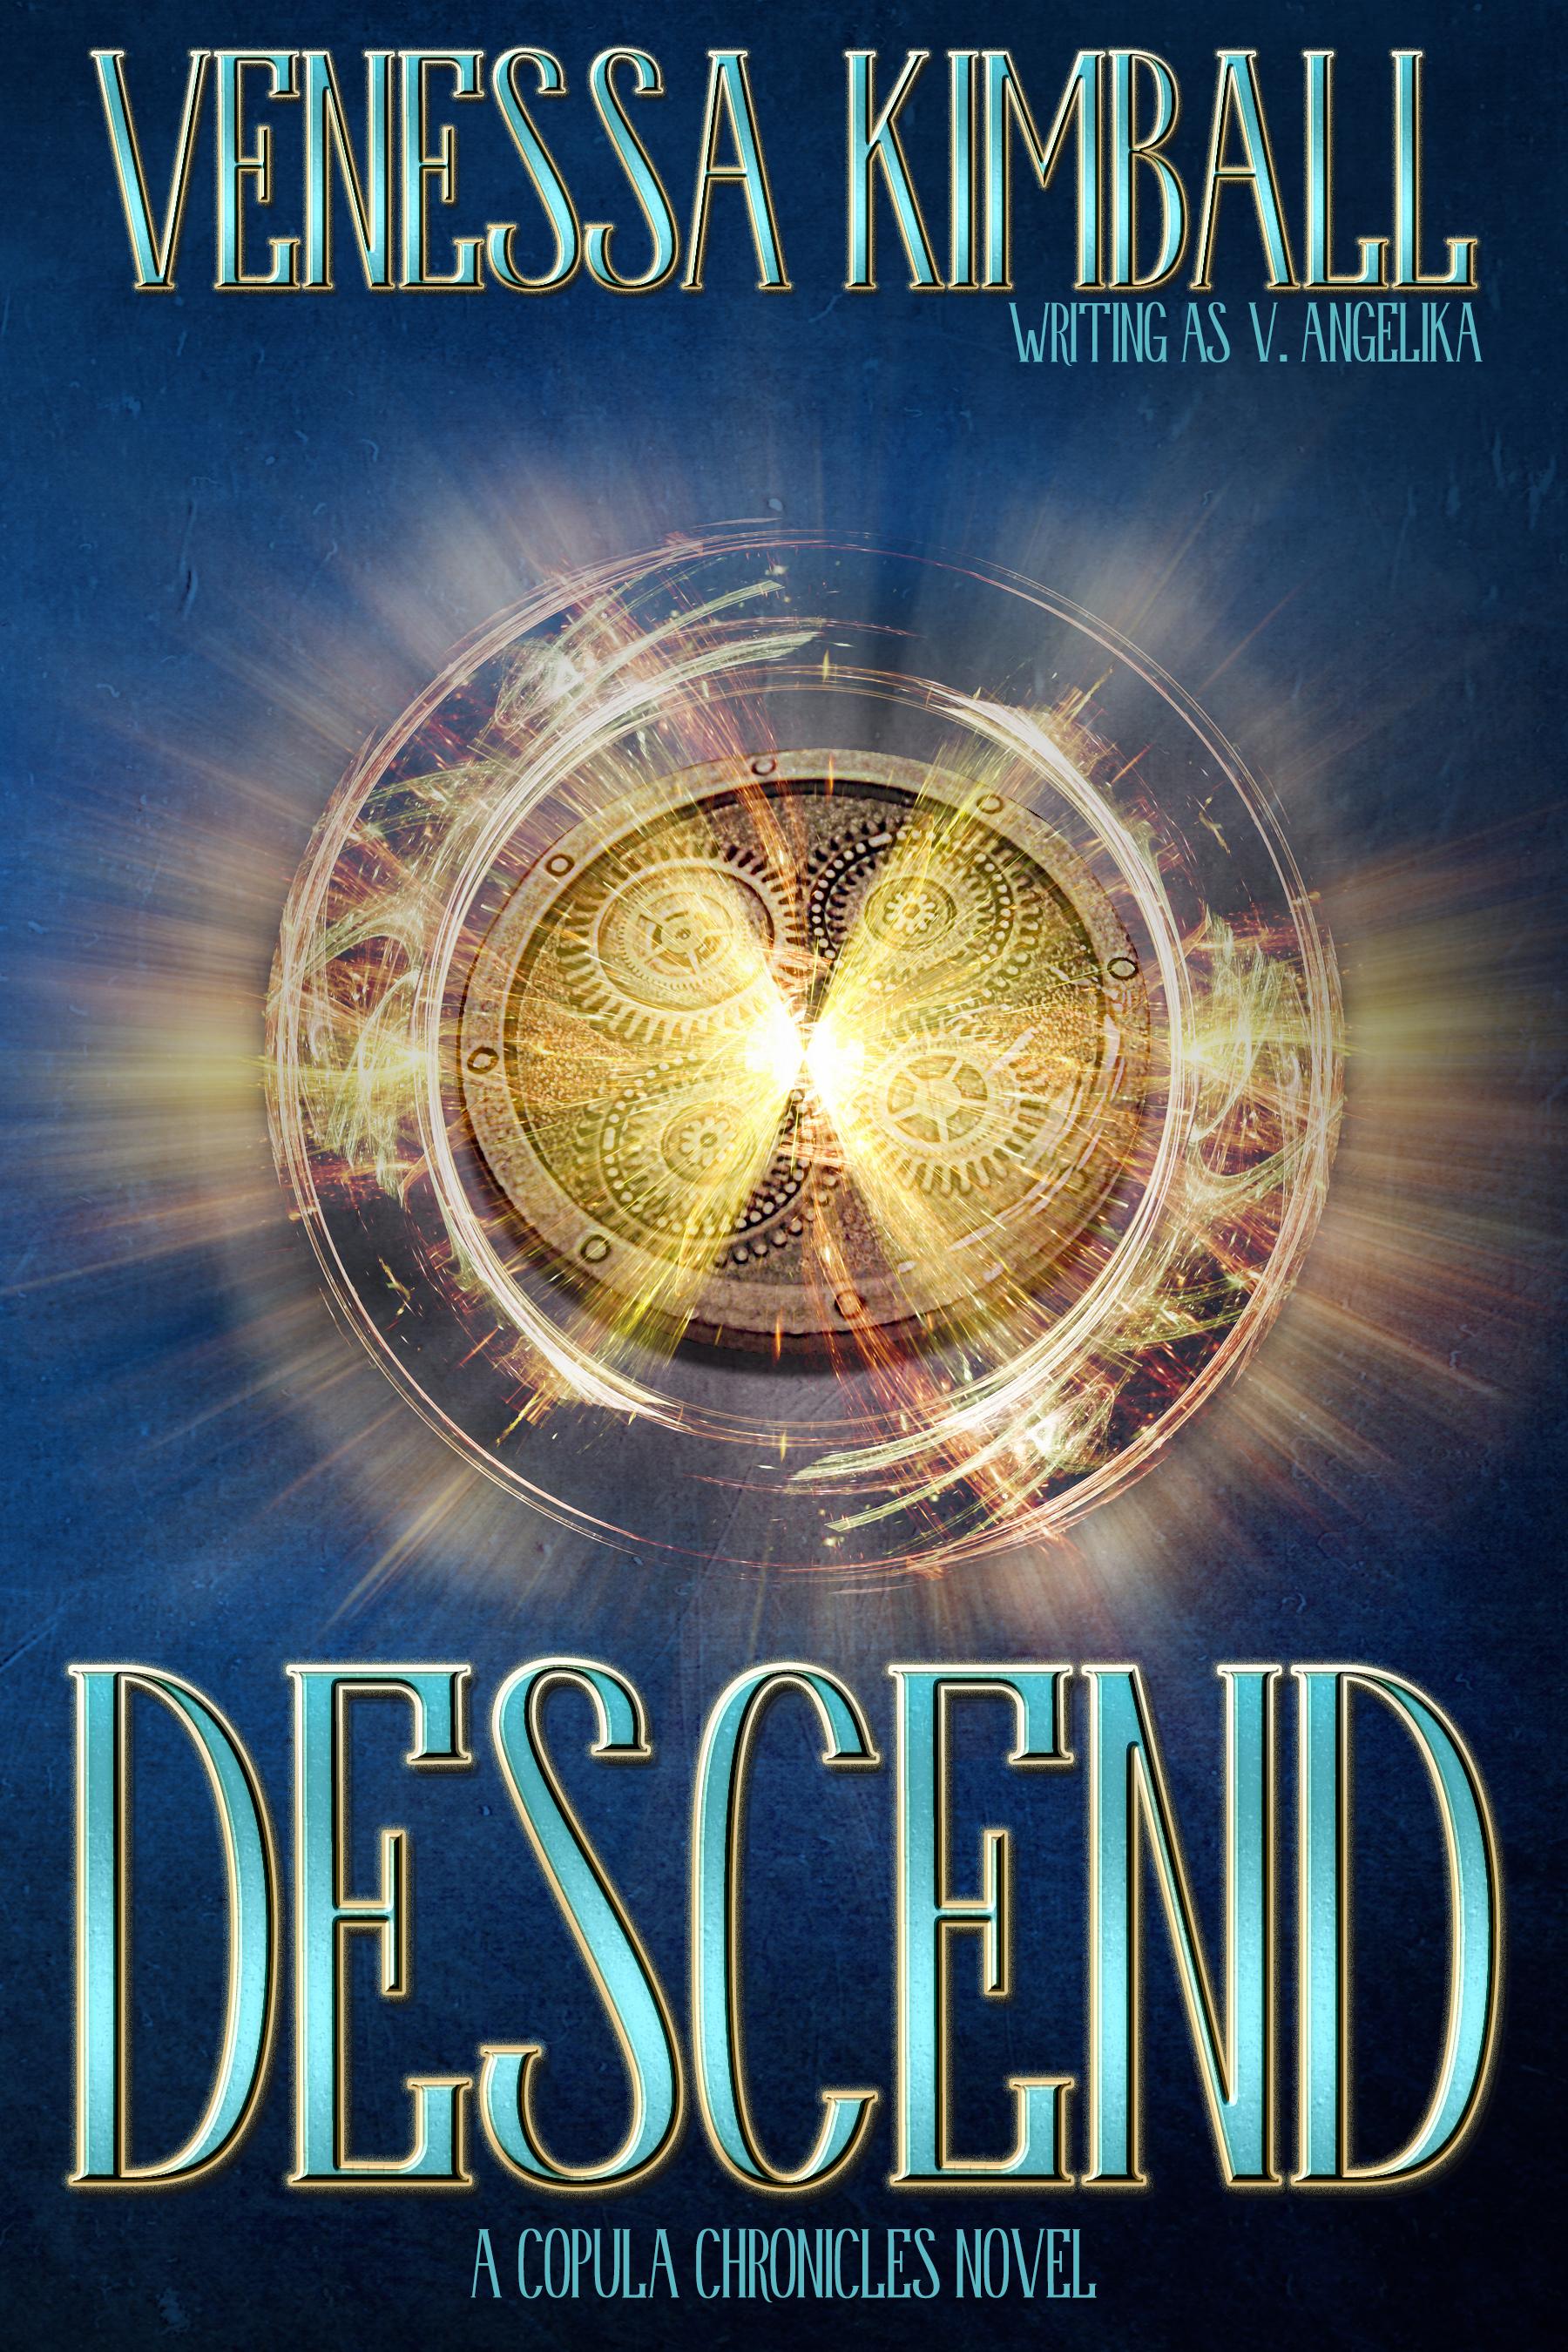 Venessa_Kimball_Descend_Ebook_Full_Size